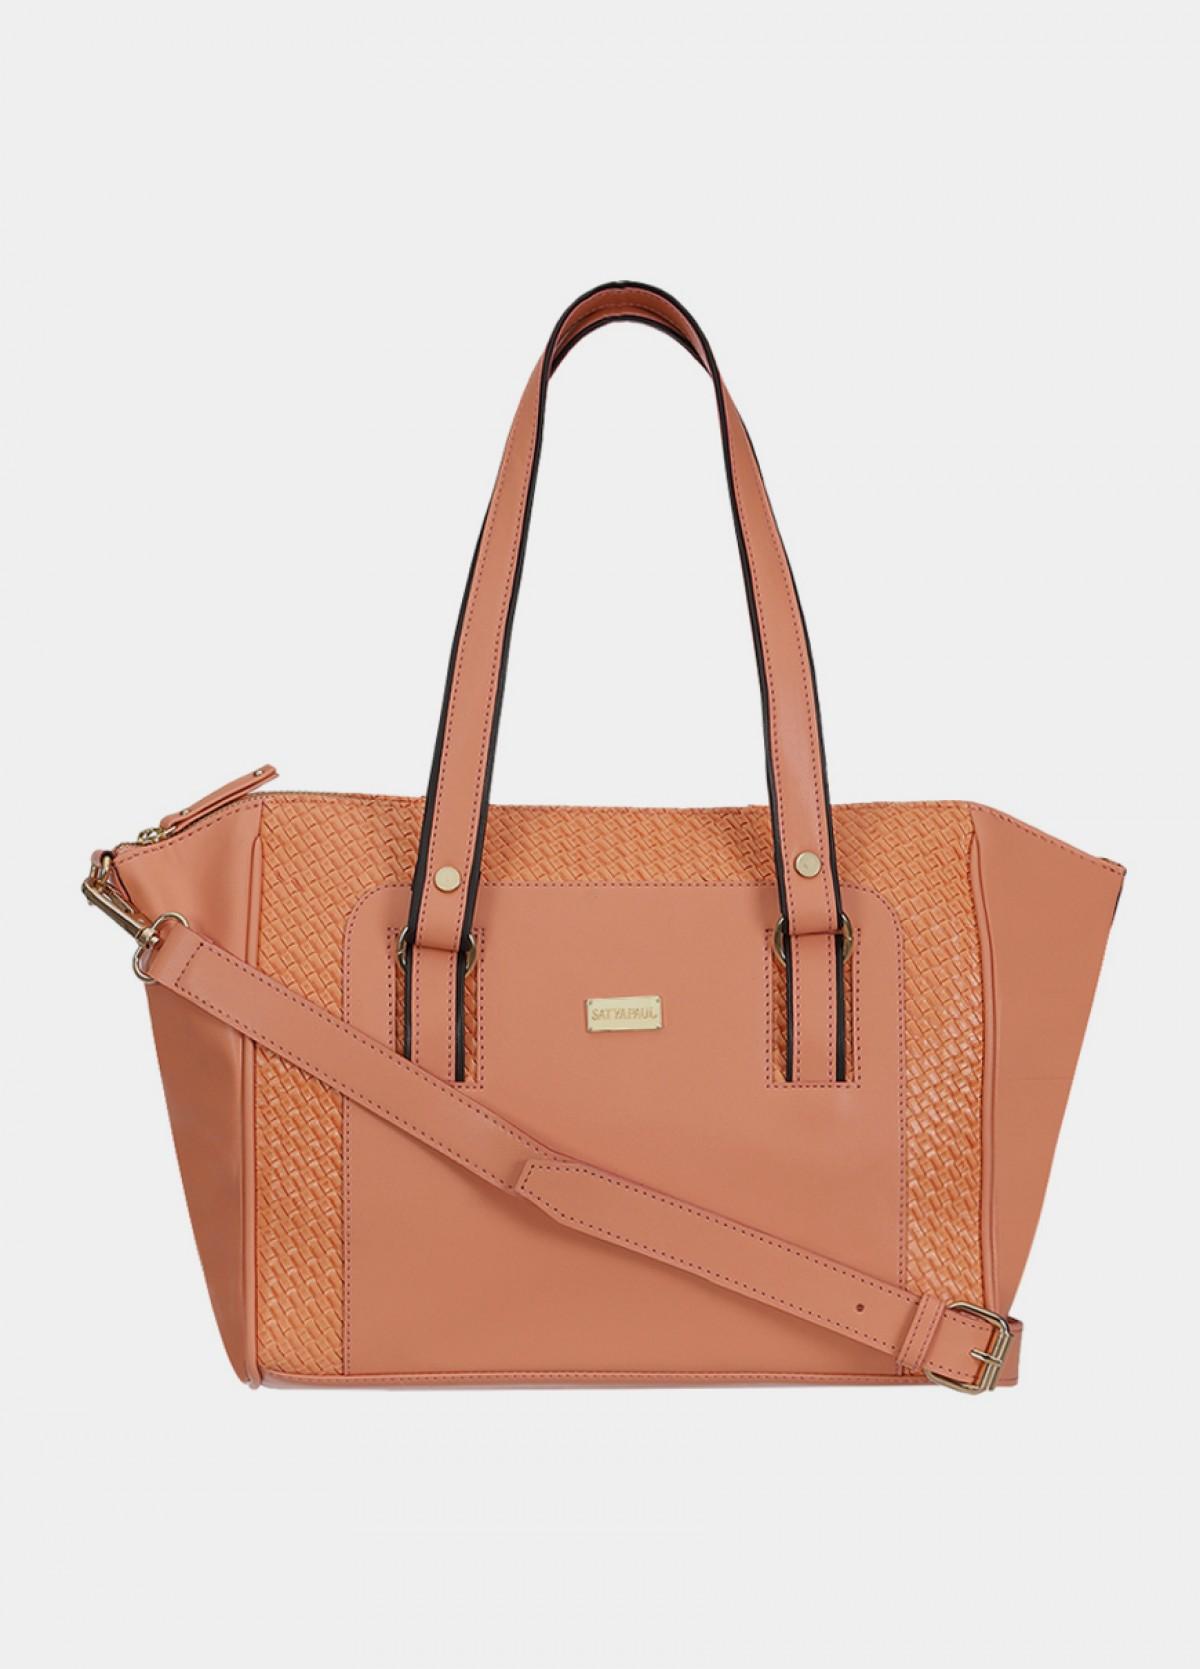 The Satyapaul Women Fashion Peach Hand Bag